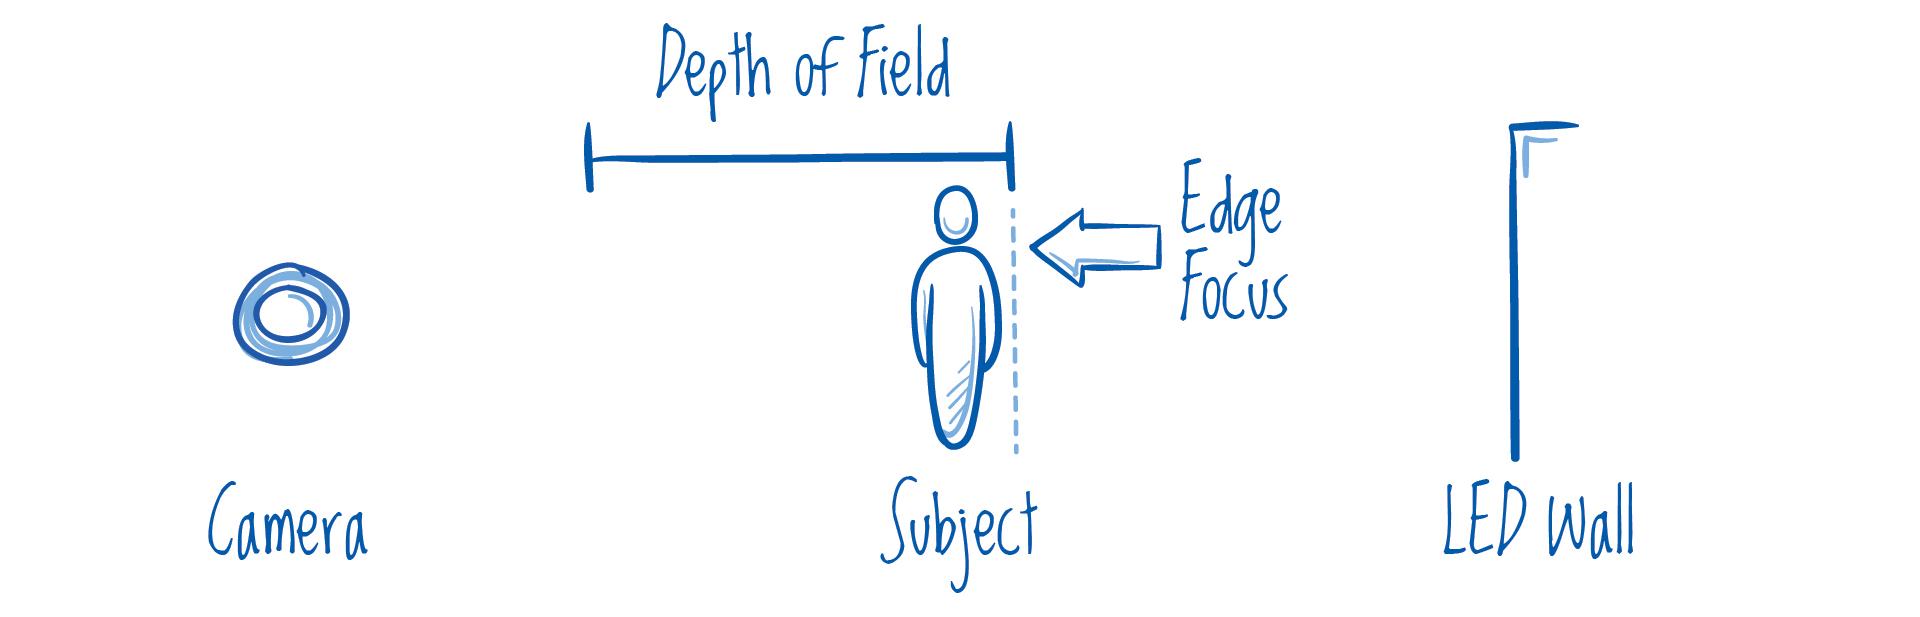 Edge Focus.jpg